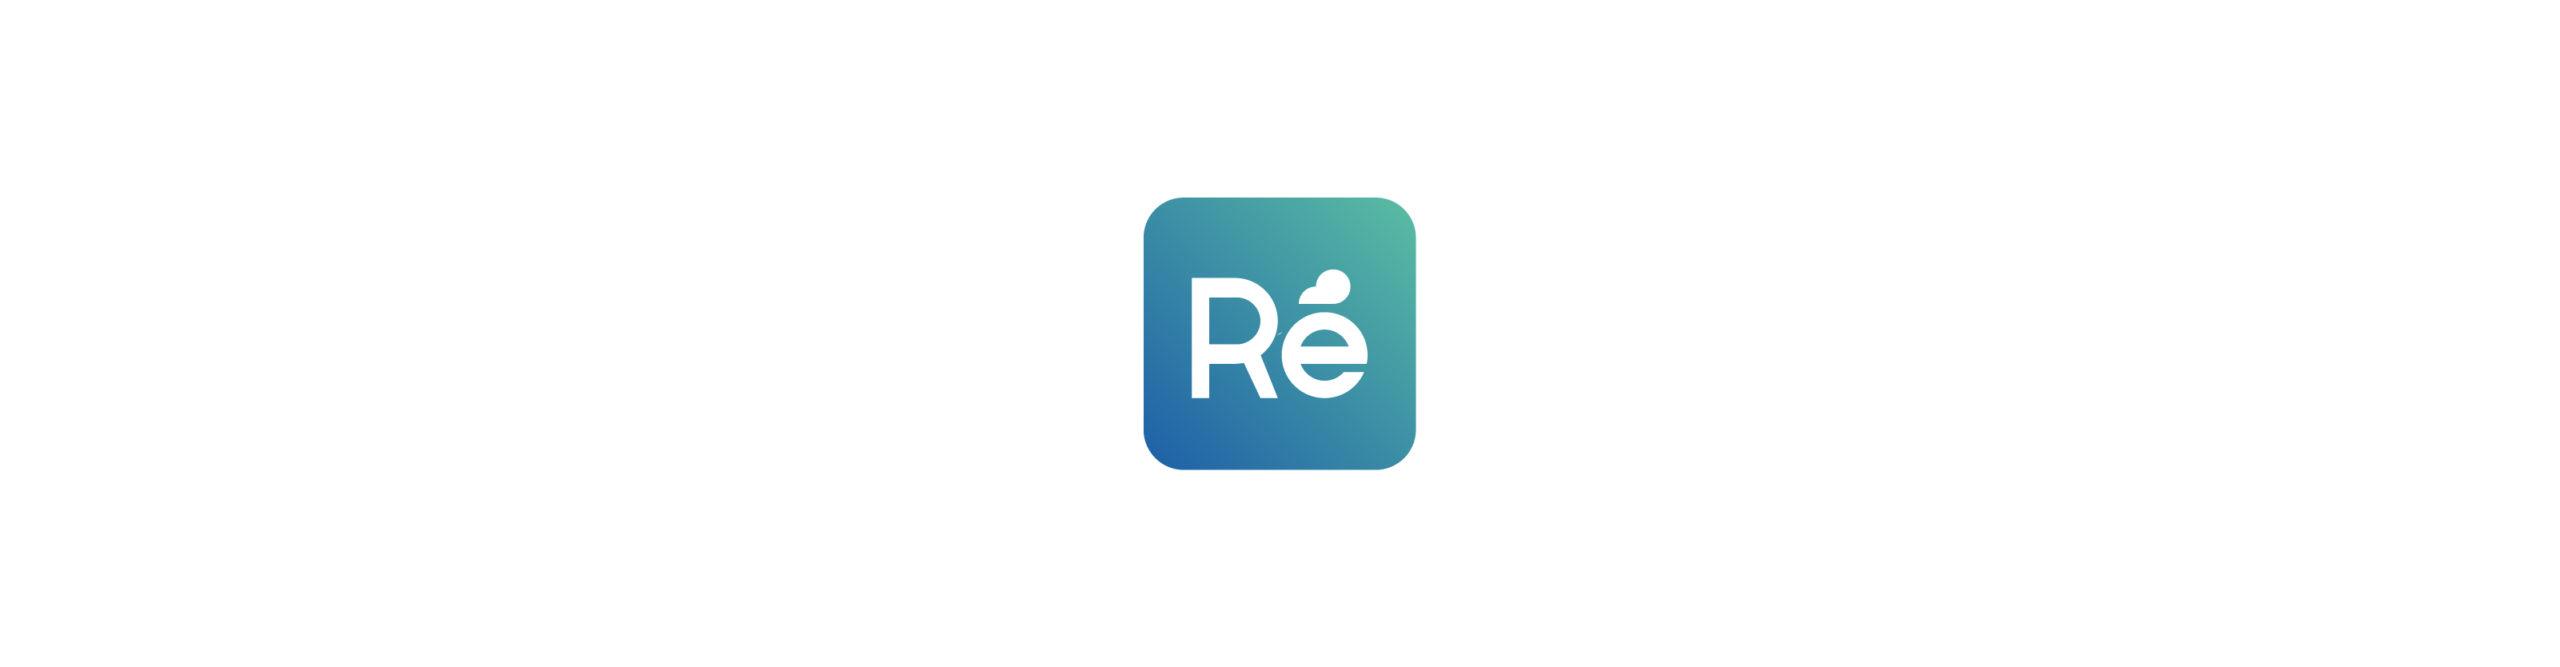 Reuniscope logo